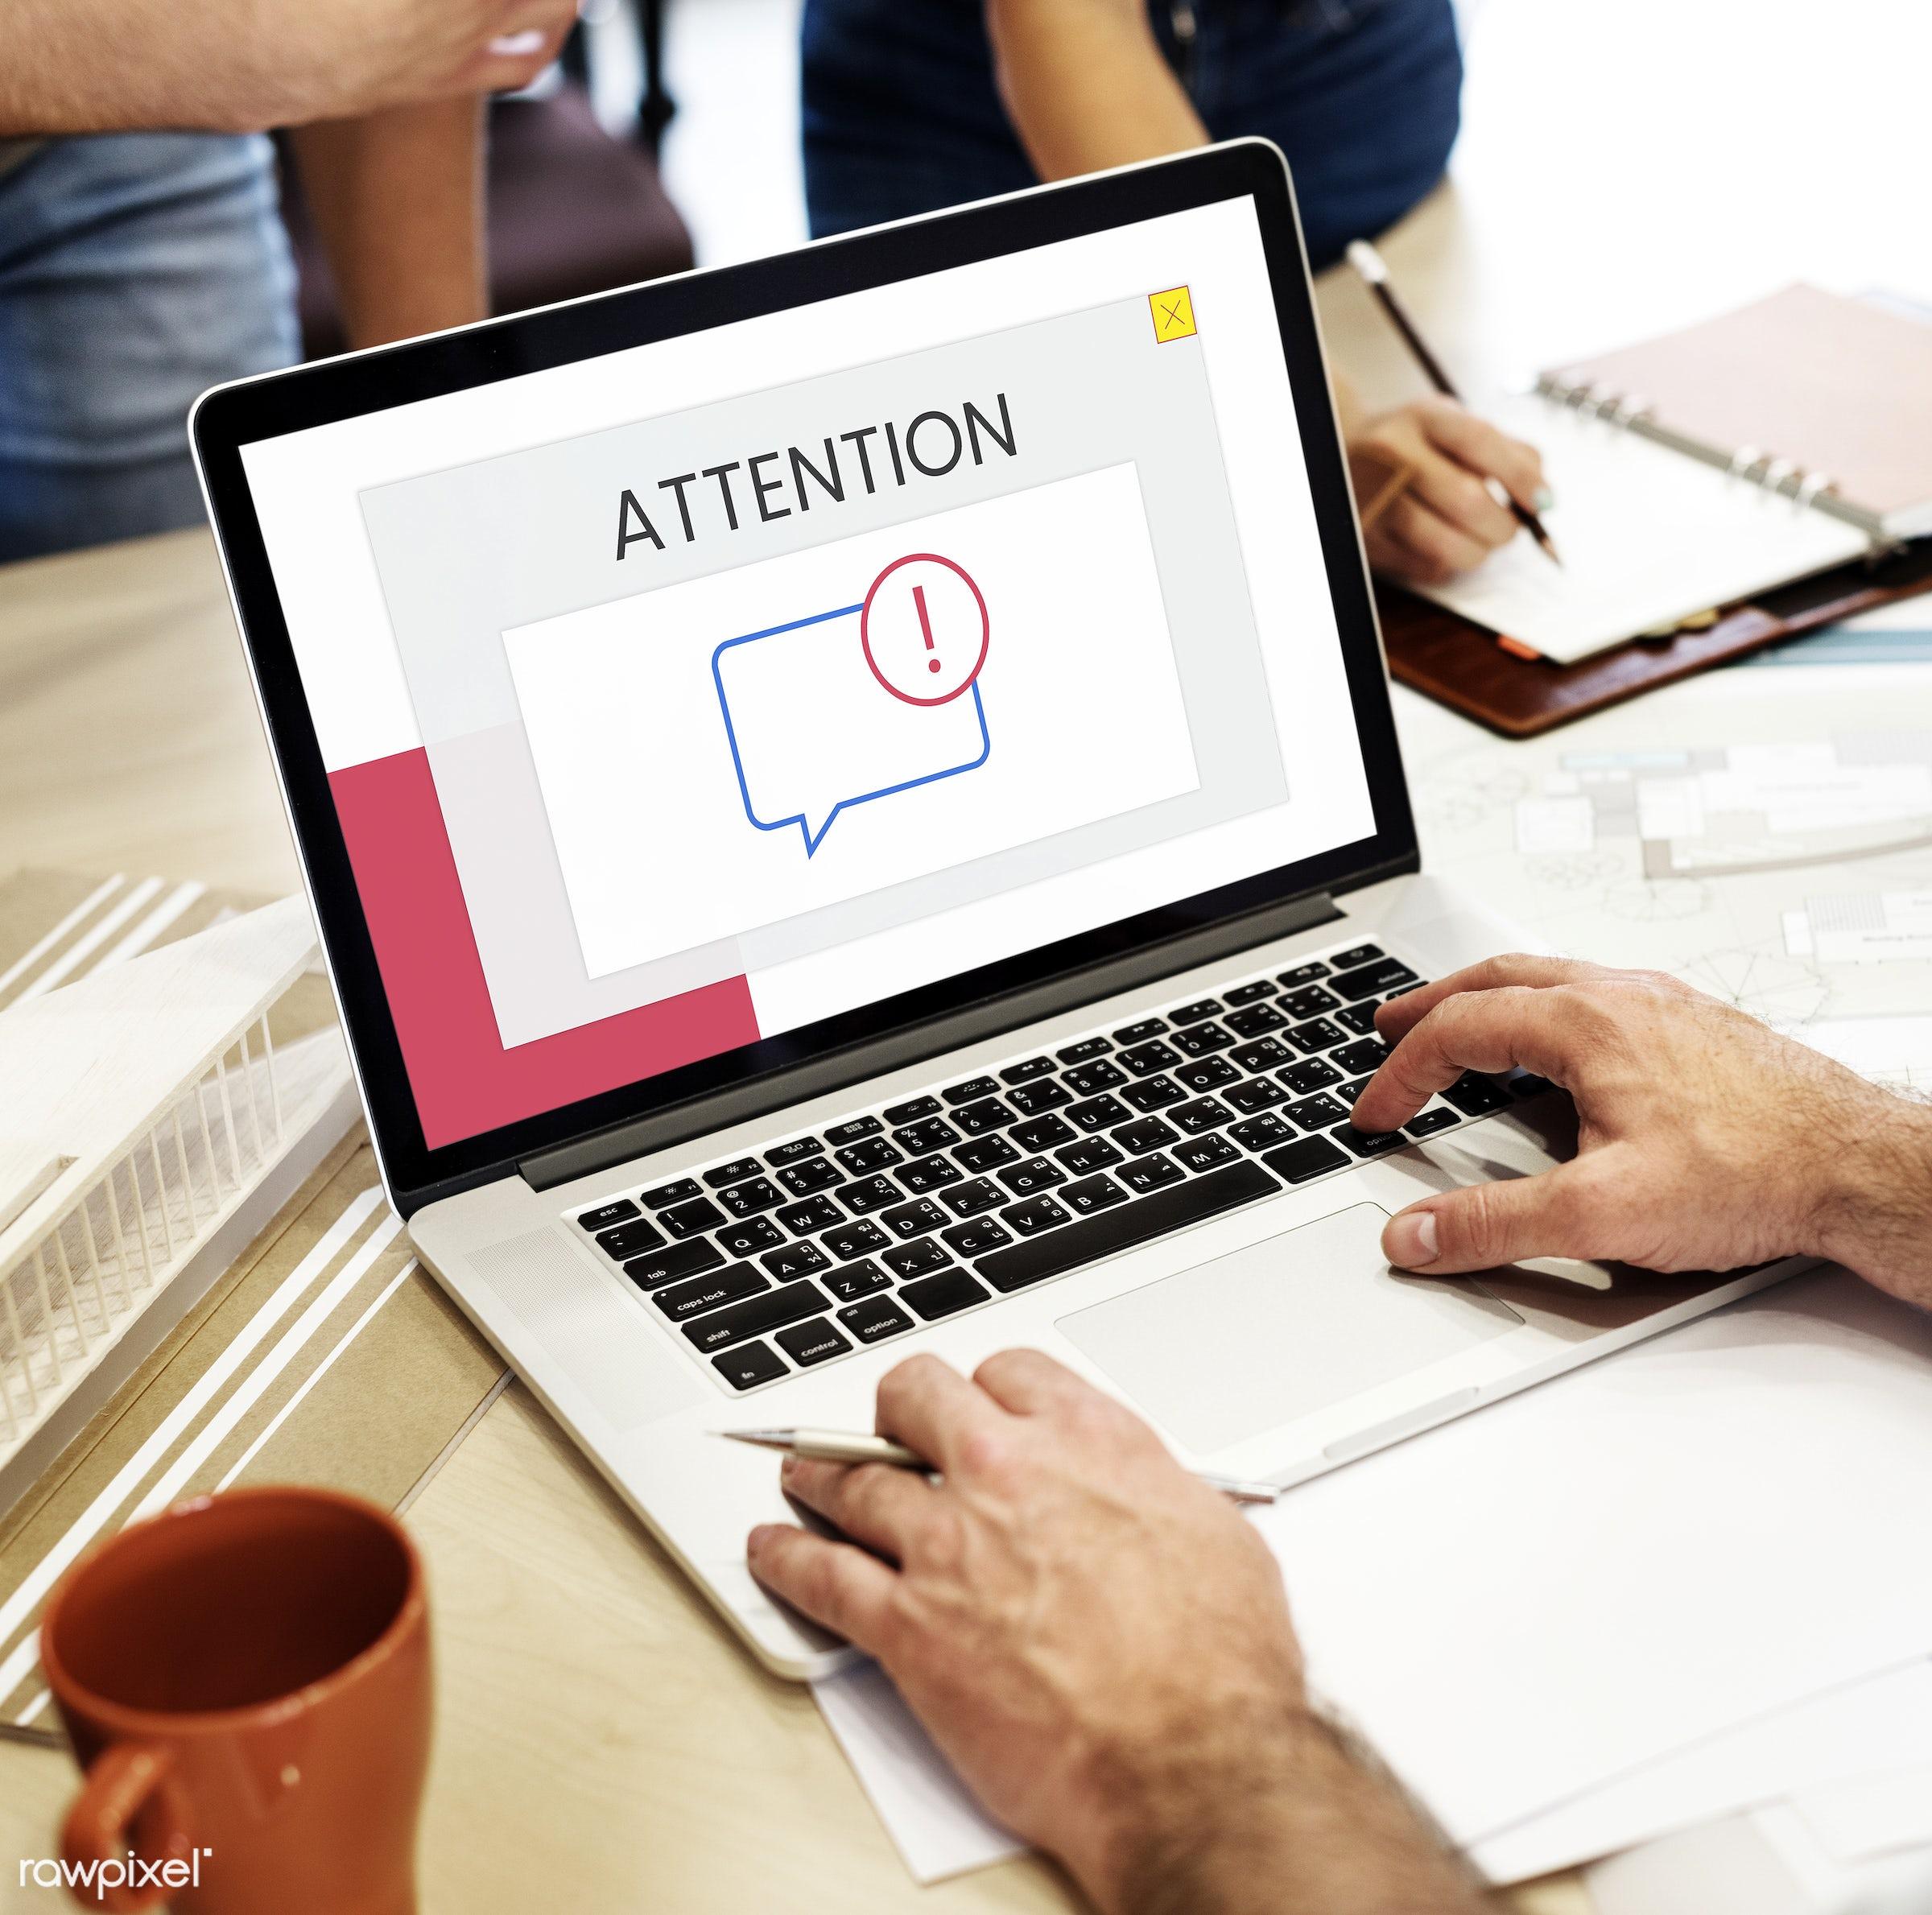 alert, architect, architecture, art, attention, beware, blueprint, business, caution, coffee, coffee cup, communication,...